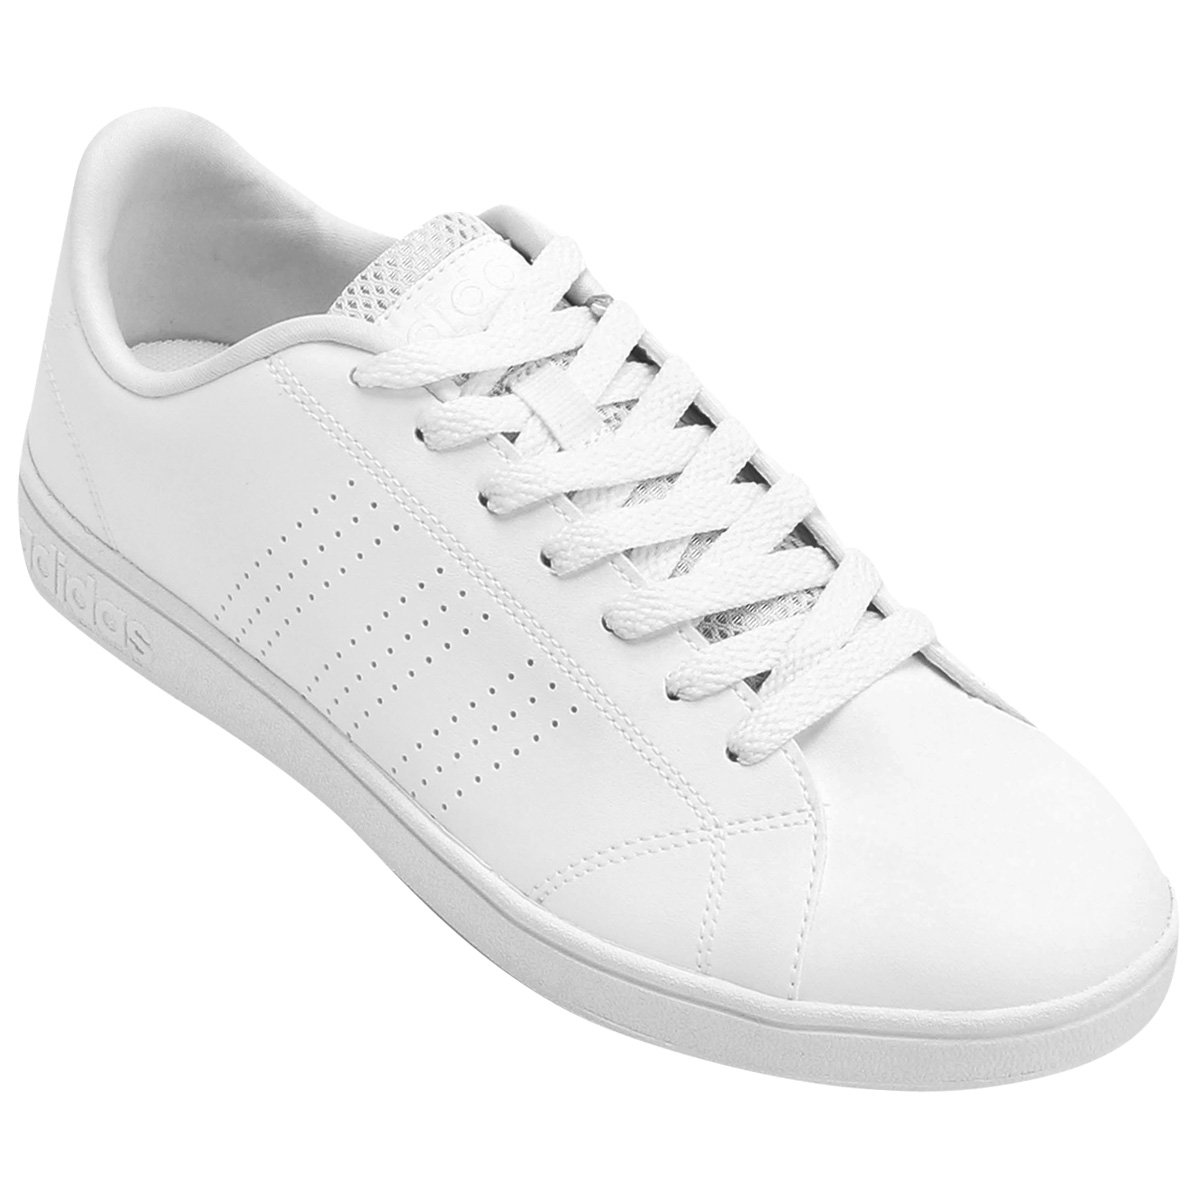 d295d7509 Tênis Adidas Vs Advantage Clean Masculino - Branco - Compre Agora ...